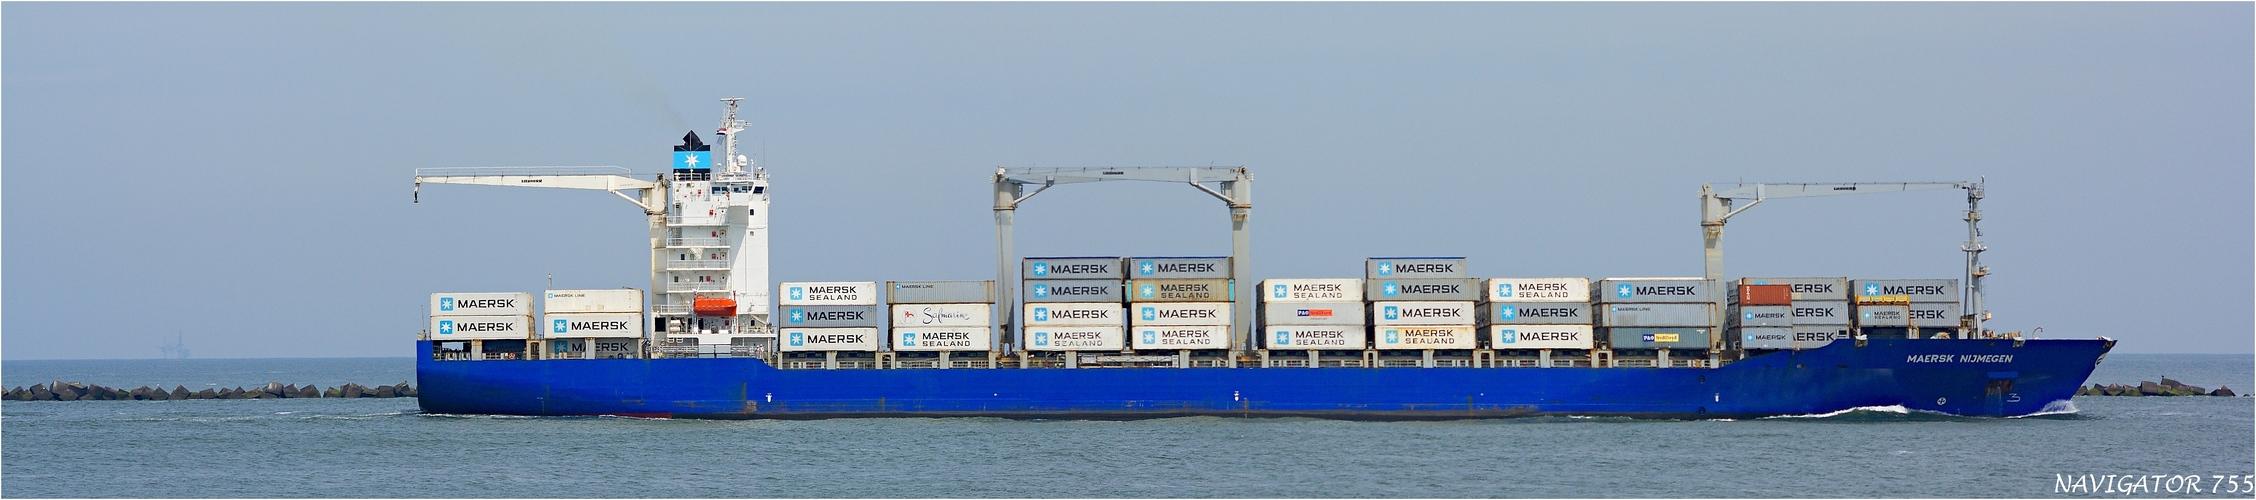 MAERSK NIJMEGEN / Container Ship.  /  Bitte scrollen!